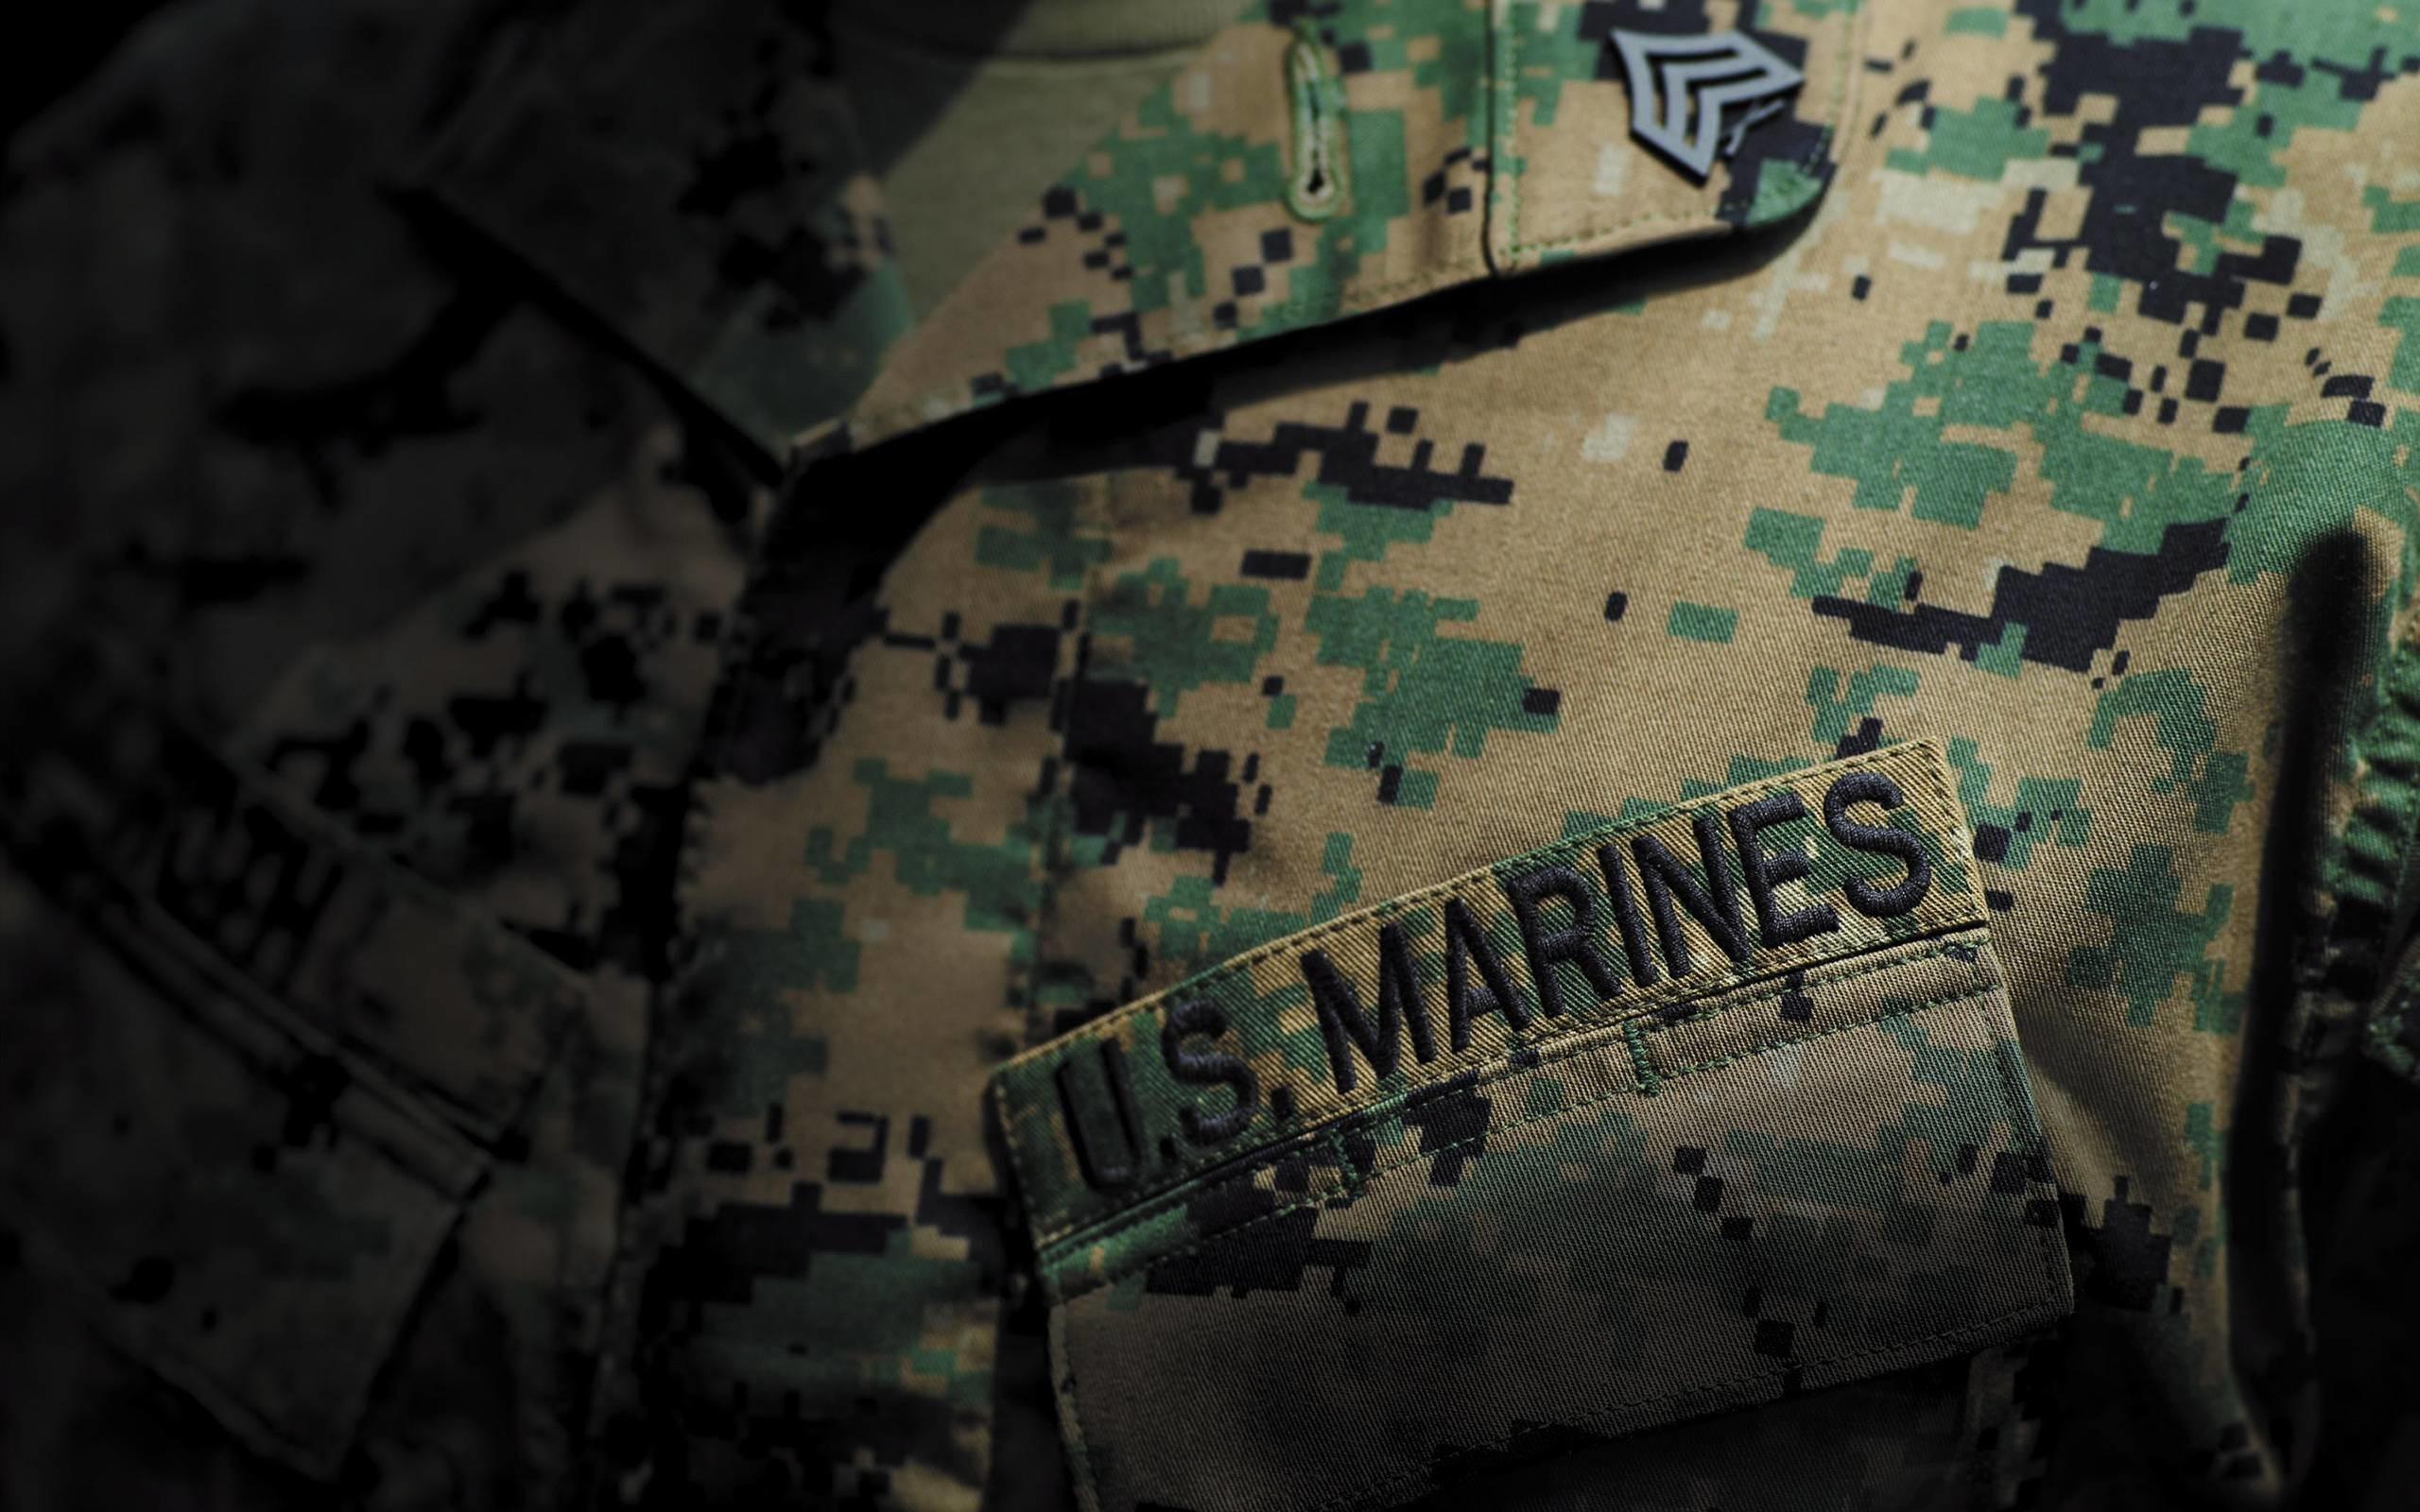 Marines Best Wallpaper Images #93251 – Ehiyo.com